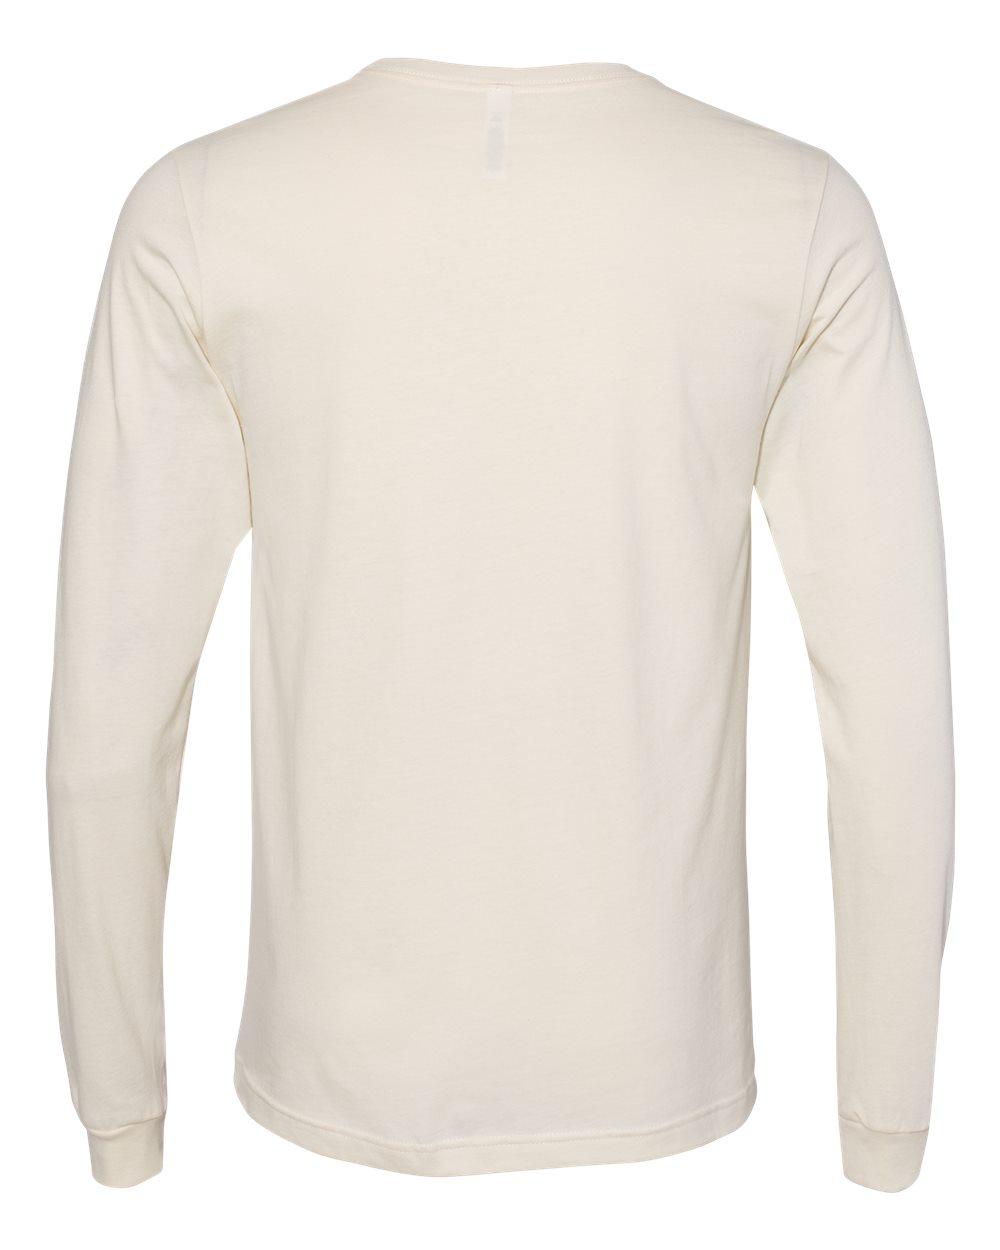 Bella-Canvas-Mens-Blank-Top-Long-Sleeve-Jersey-Tee-T-Shirt-3501-up-to-3XL thumbnail 86